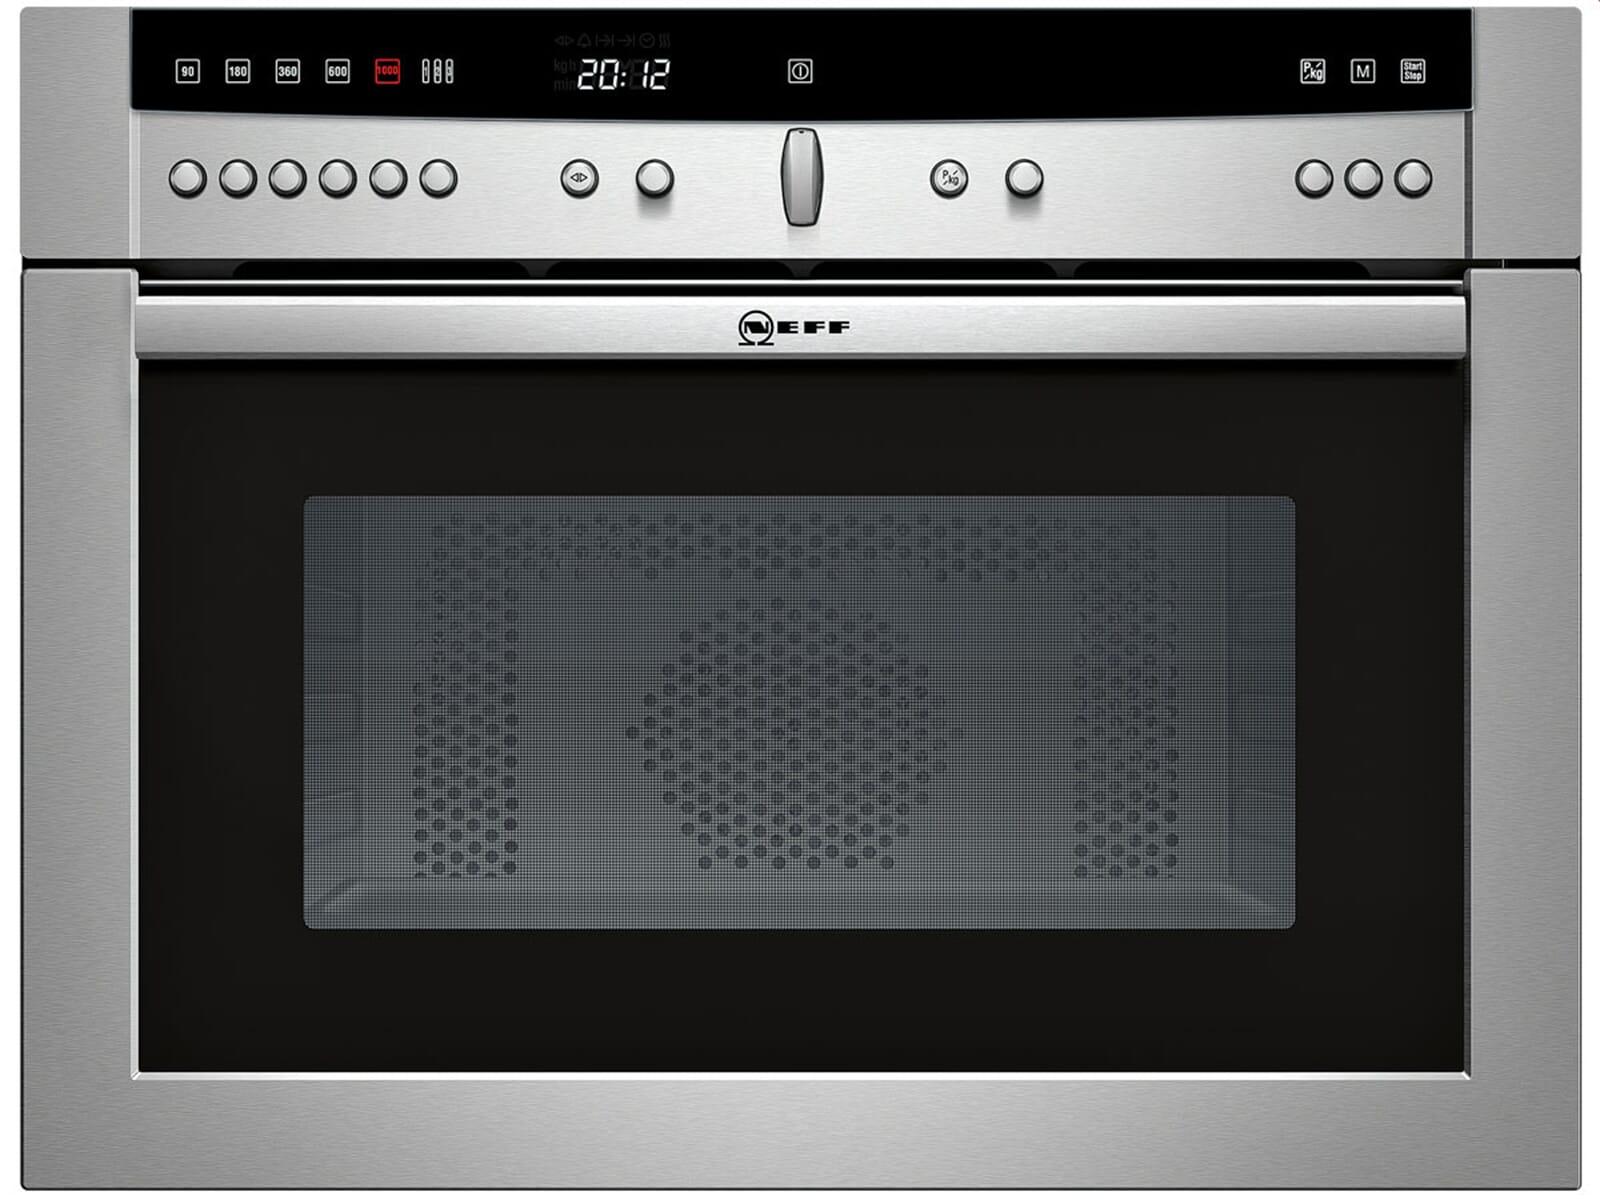 Neff CW 5740 N Kompakt Mikrowelle Edelstahl 45cm Einbau